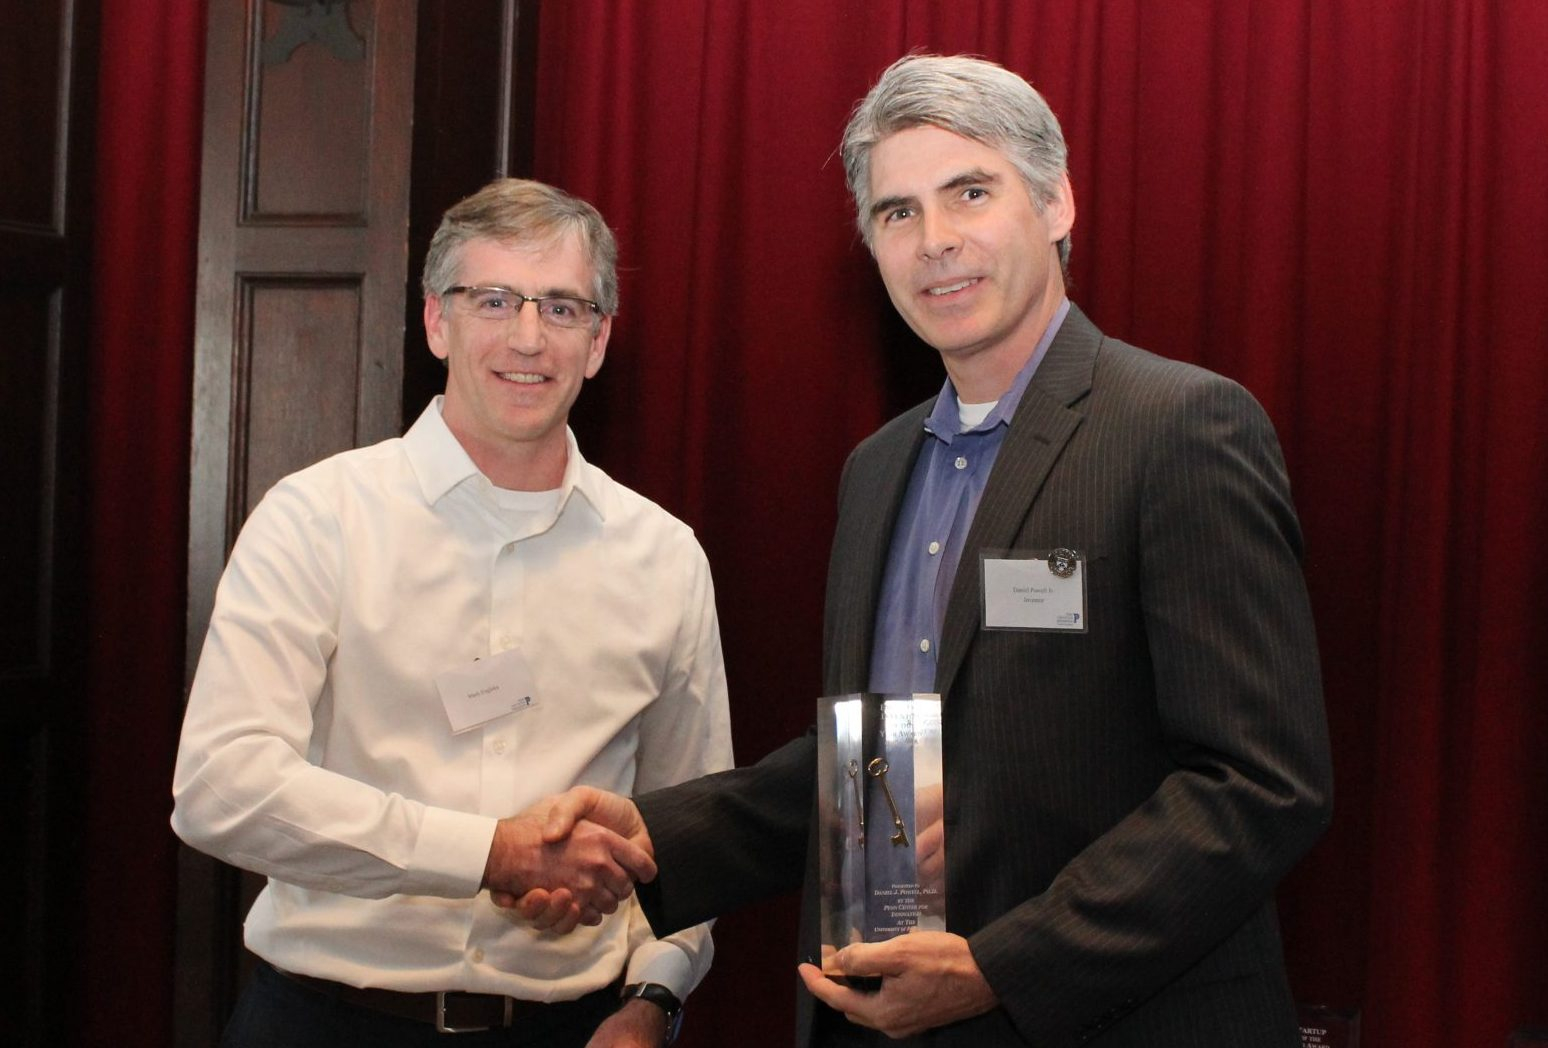 Mark Engleka presenting an award at the Celebration of Innovation